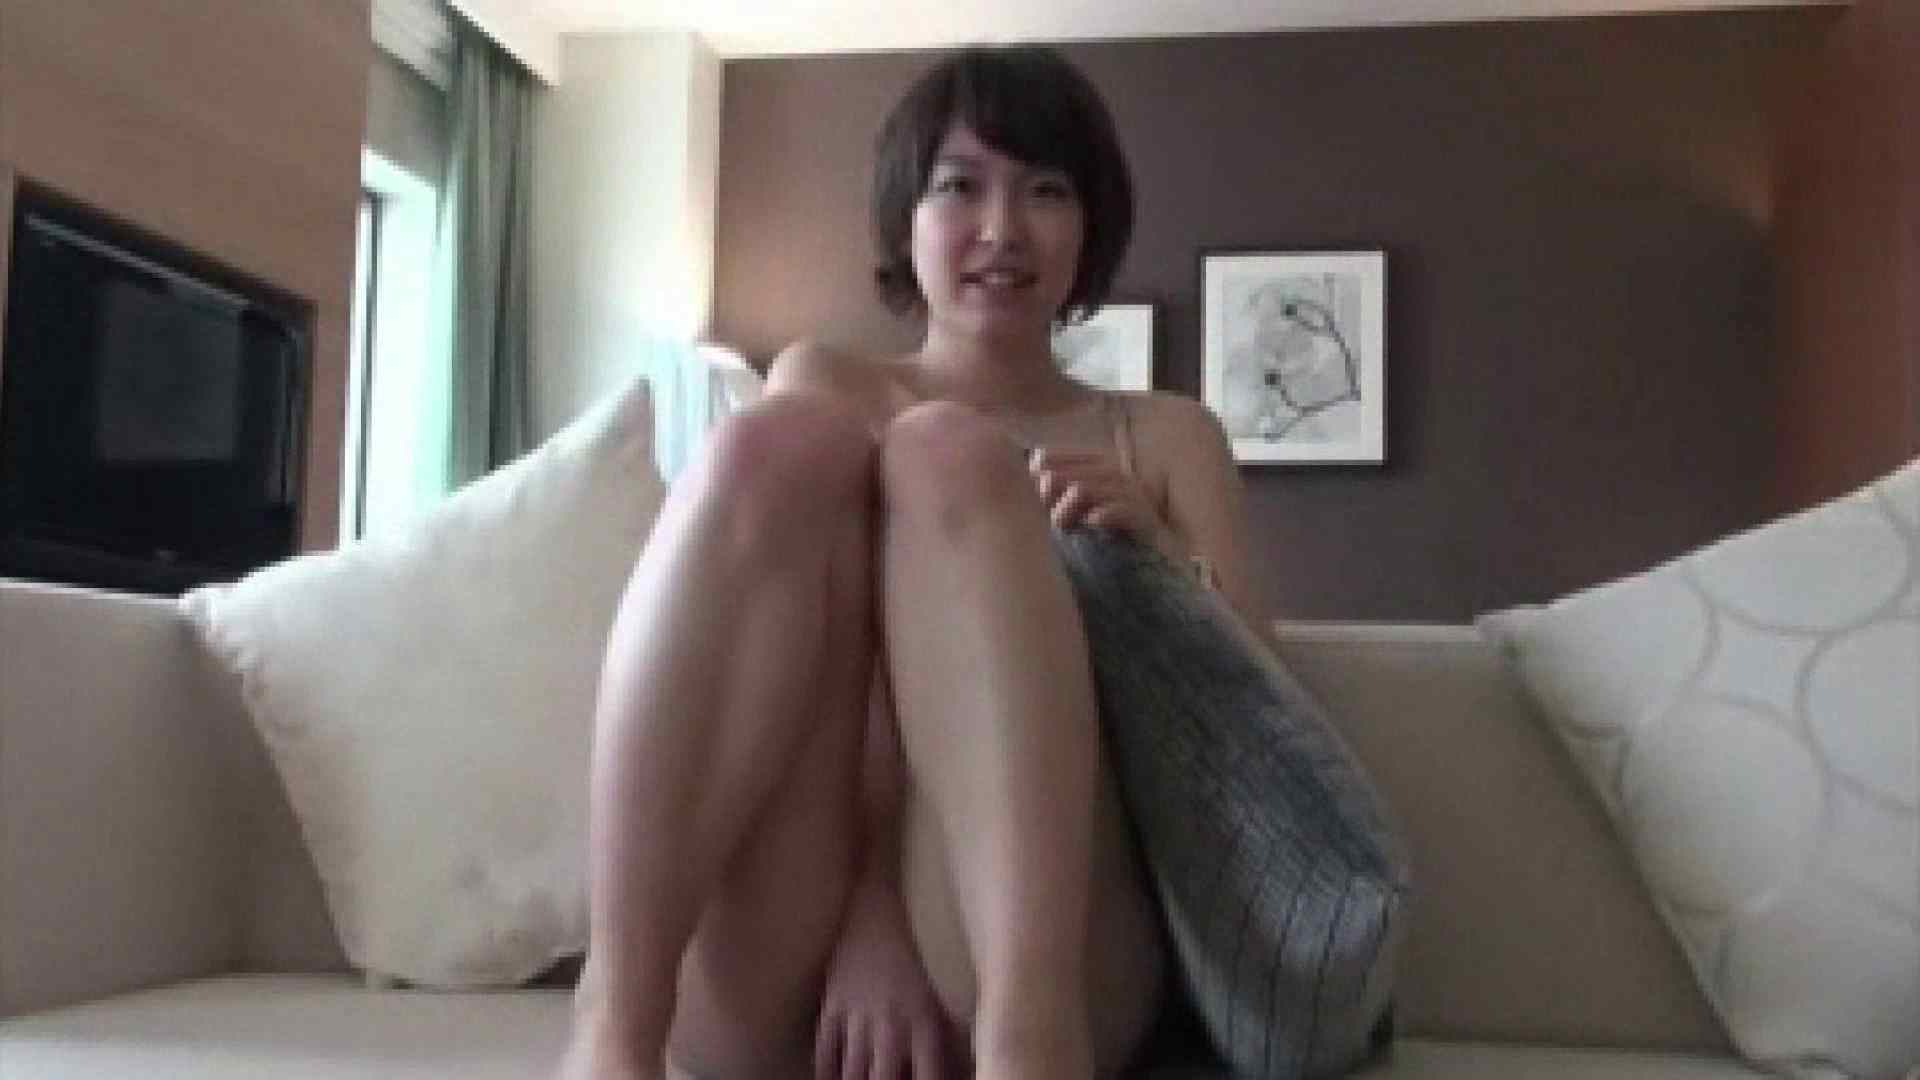 Hで可愛くてケシカラン! Vol.13 OL裸体 | 流出作品  59画像 4